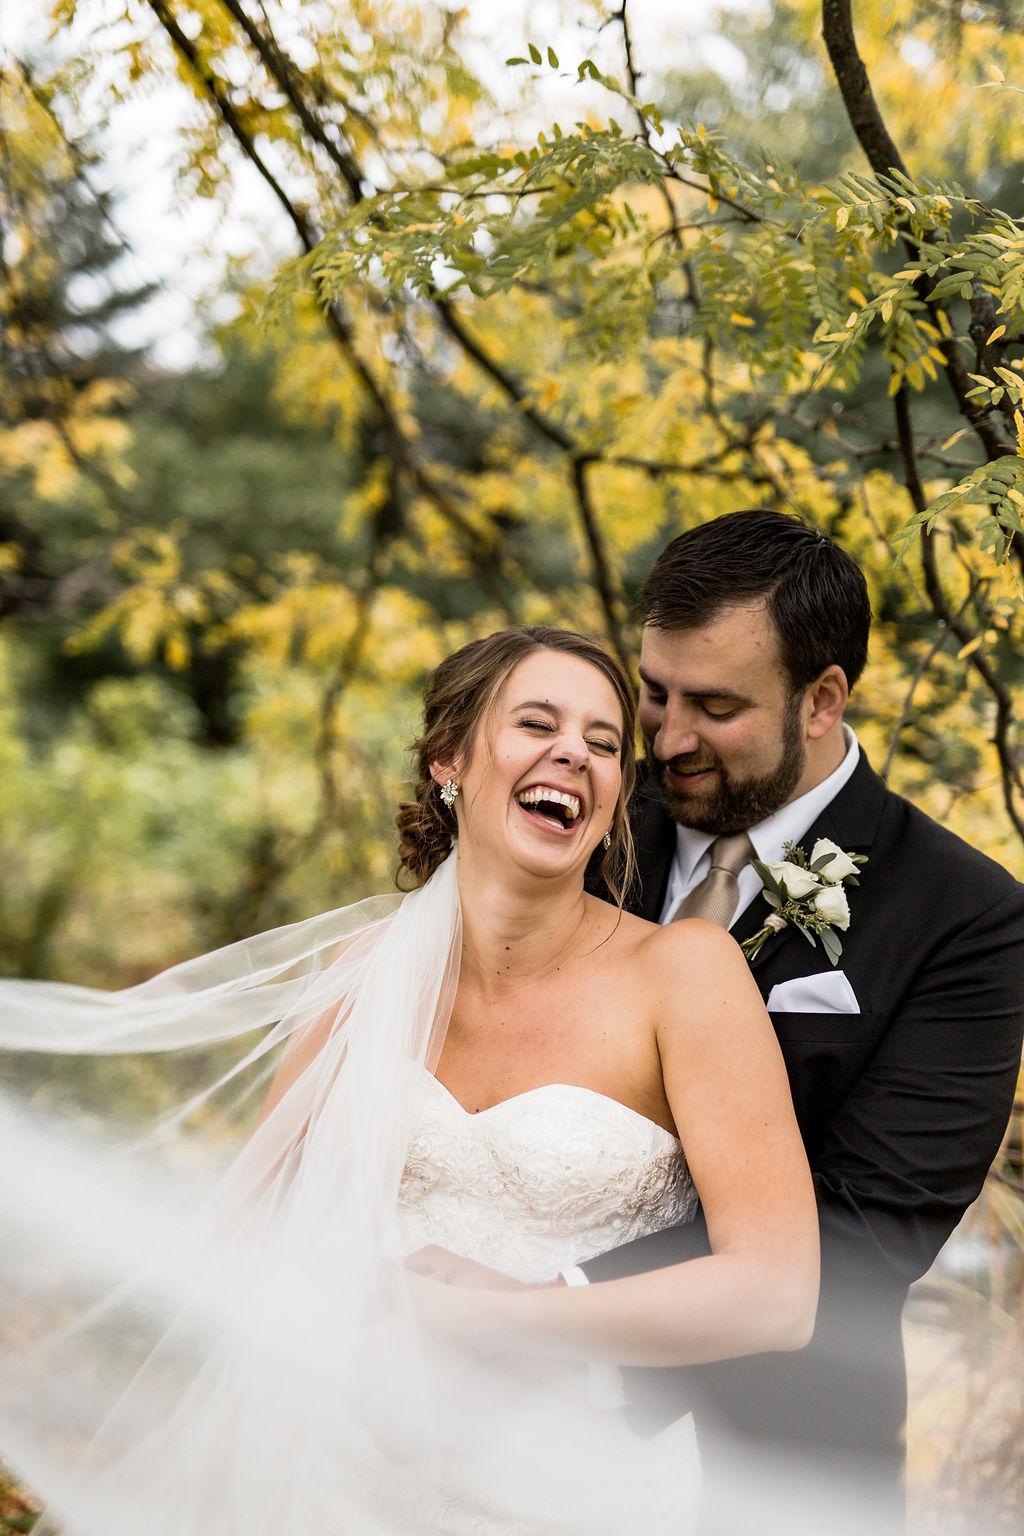 best_midwest_wedding_photographer_JMH_photography-39.jpg